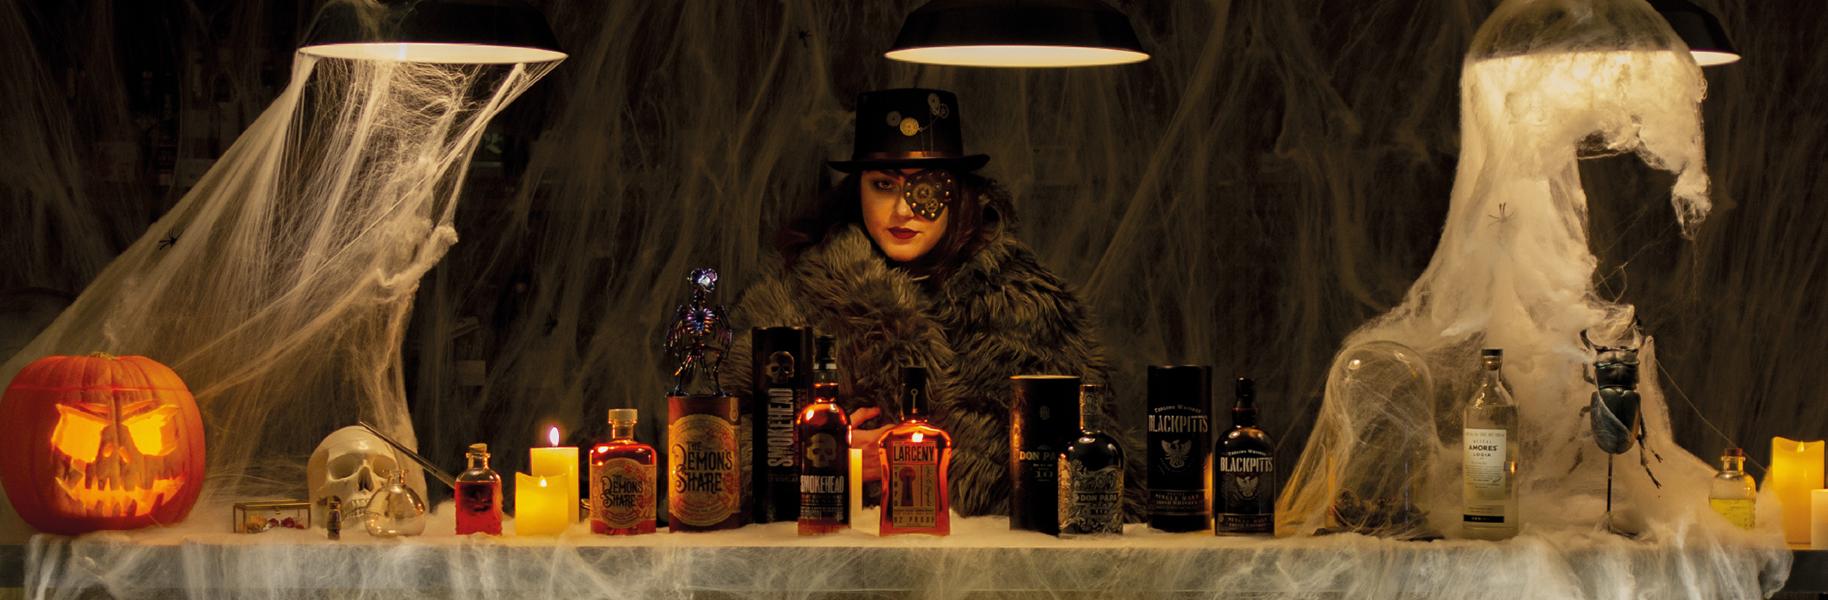 Halloween_2020 selection spiritueux dugas club expert don papa larceny rhum whisky